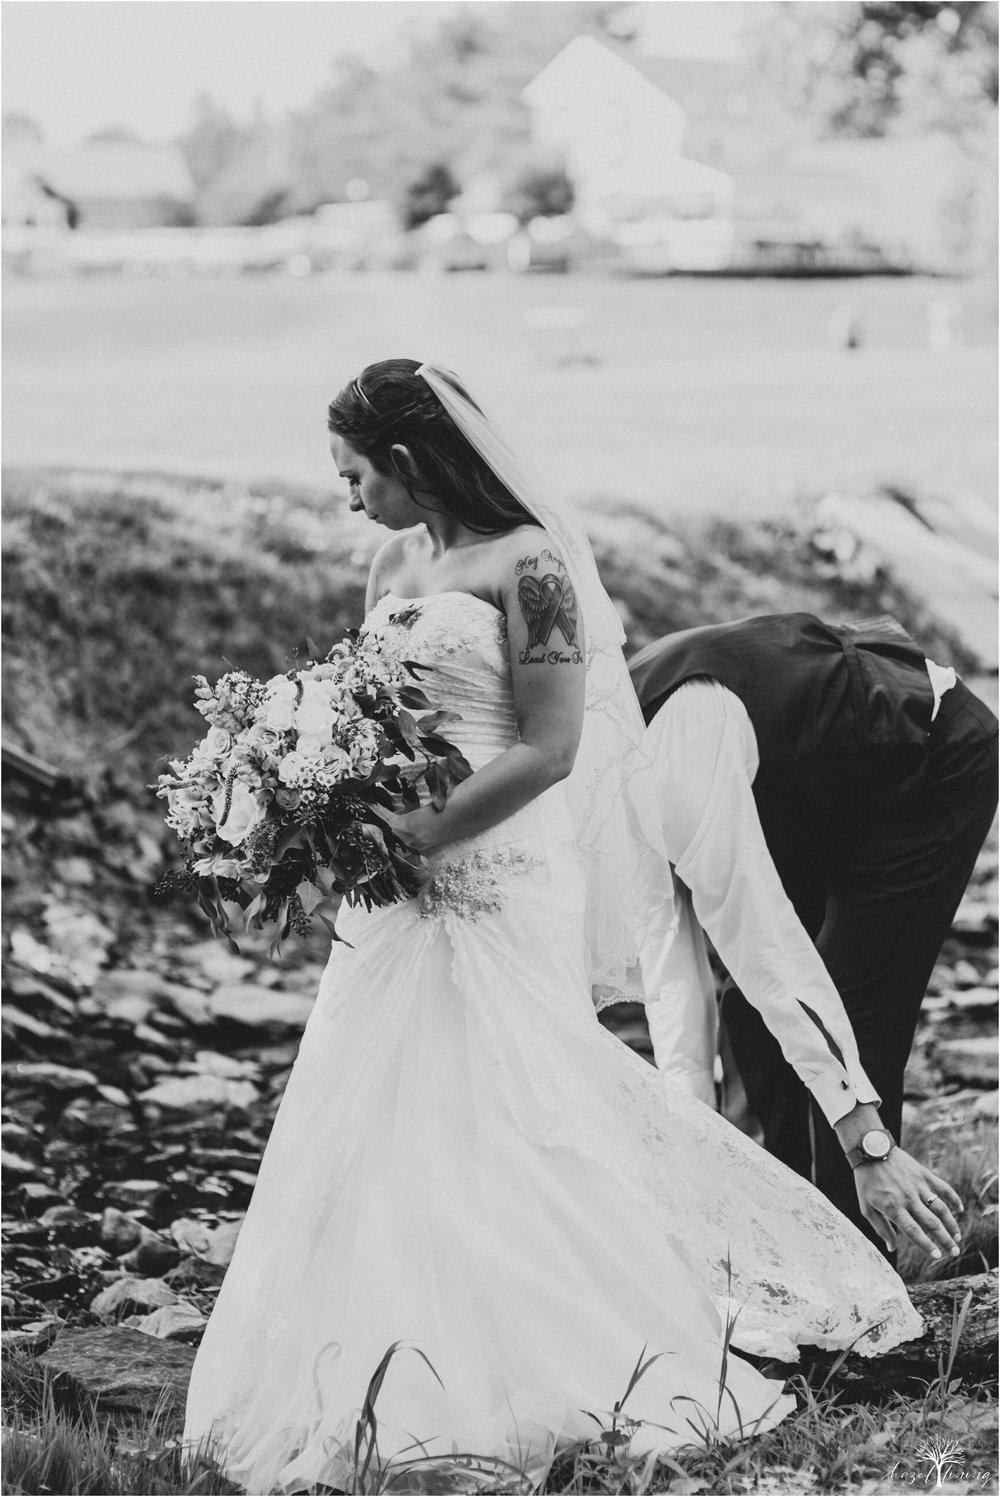 alyssa-james-stiteler-wedding-loft-and-sweet-water-cc-pennsburg-pennsylvania-hazel-lining-travel-wedding-elopement-photography_0090.jpg